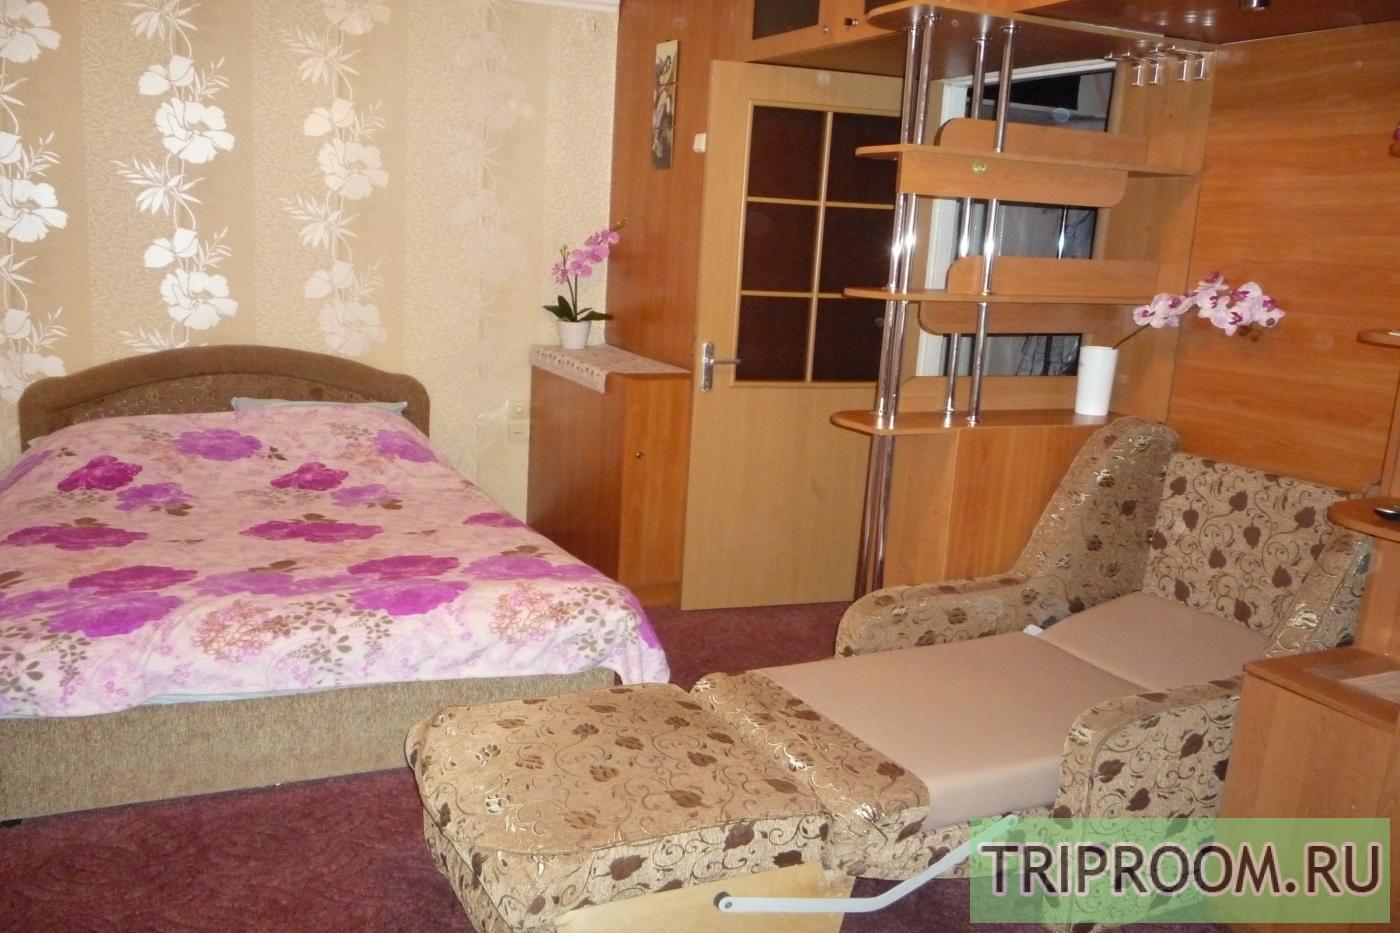 1-комнатная квартира посуточно (вариант № 13441), ул. Гагарина проспект, фото № 4